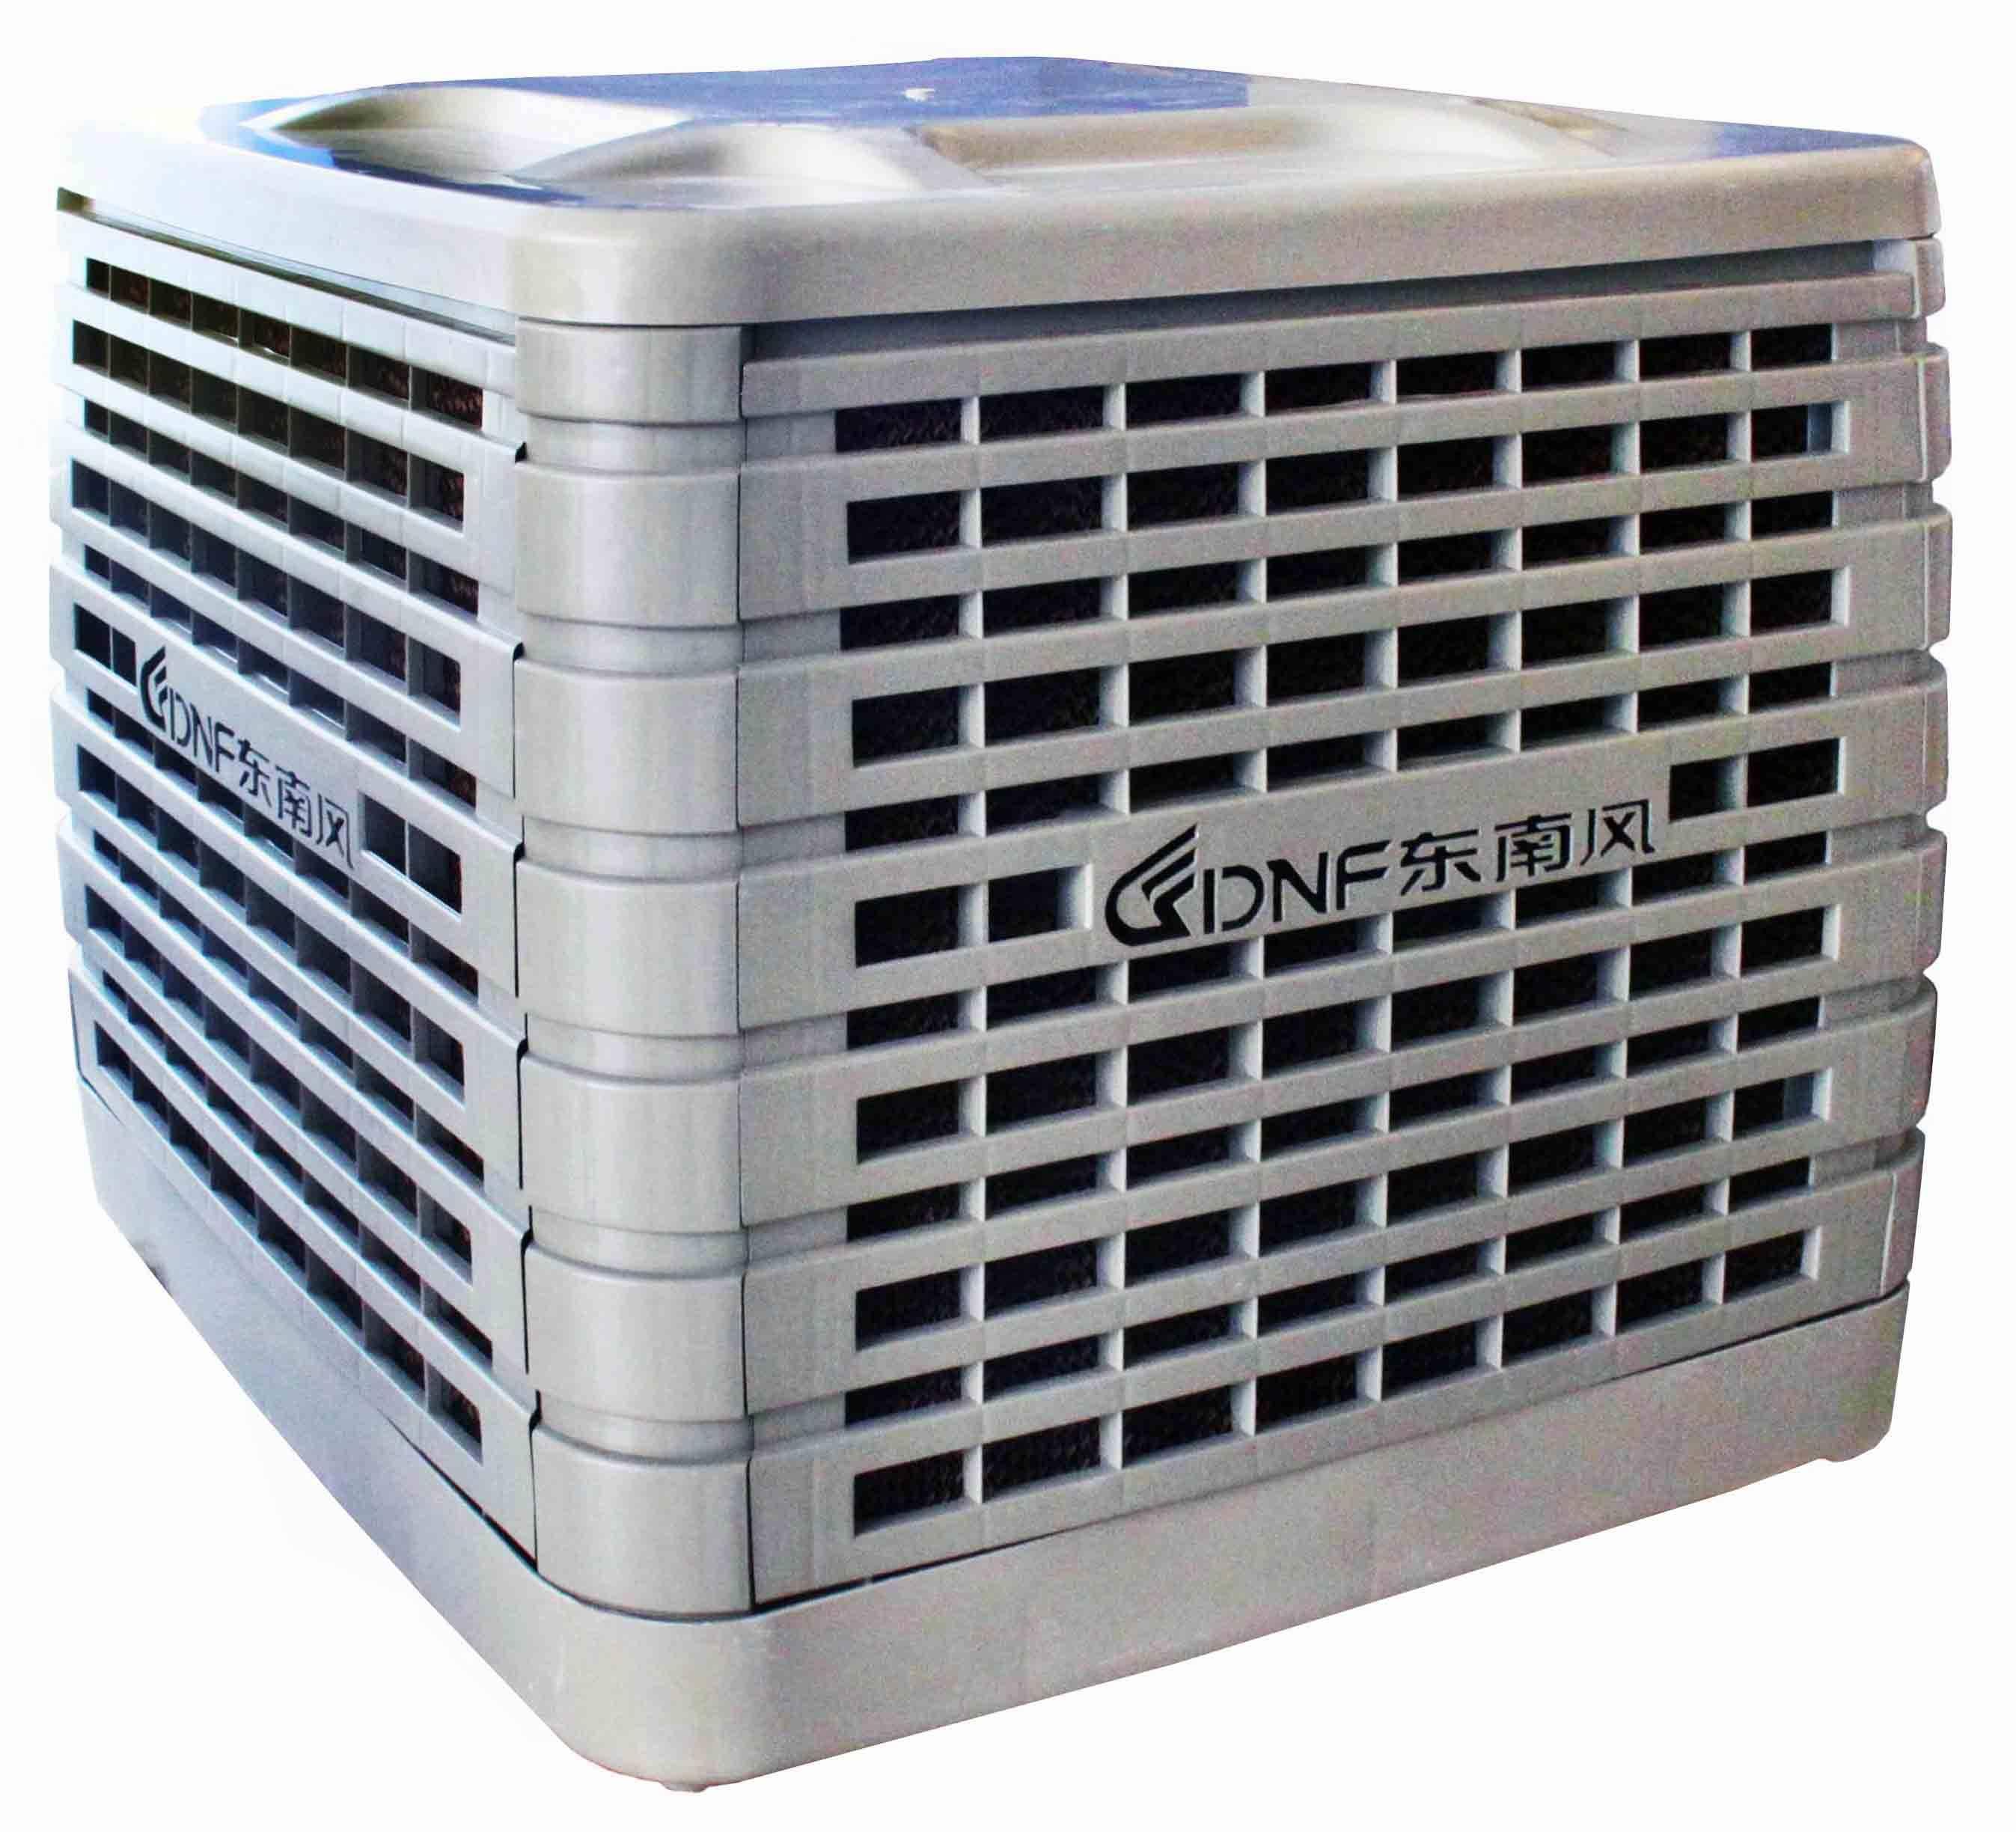 ENERGY SAVING EVAPORATIVE AIR CONDITIONER AIR COOLER